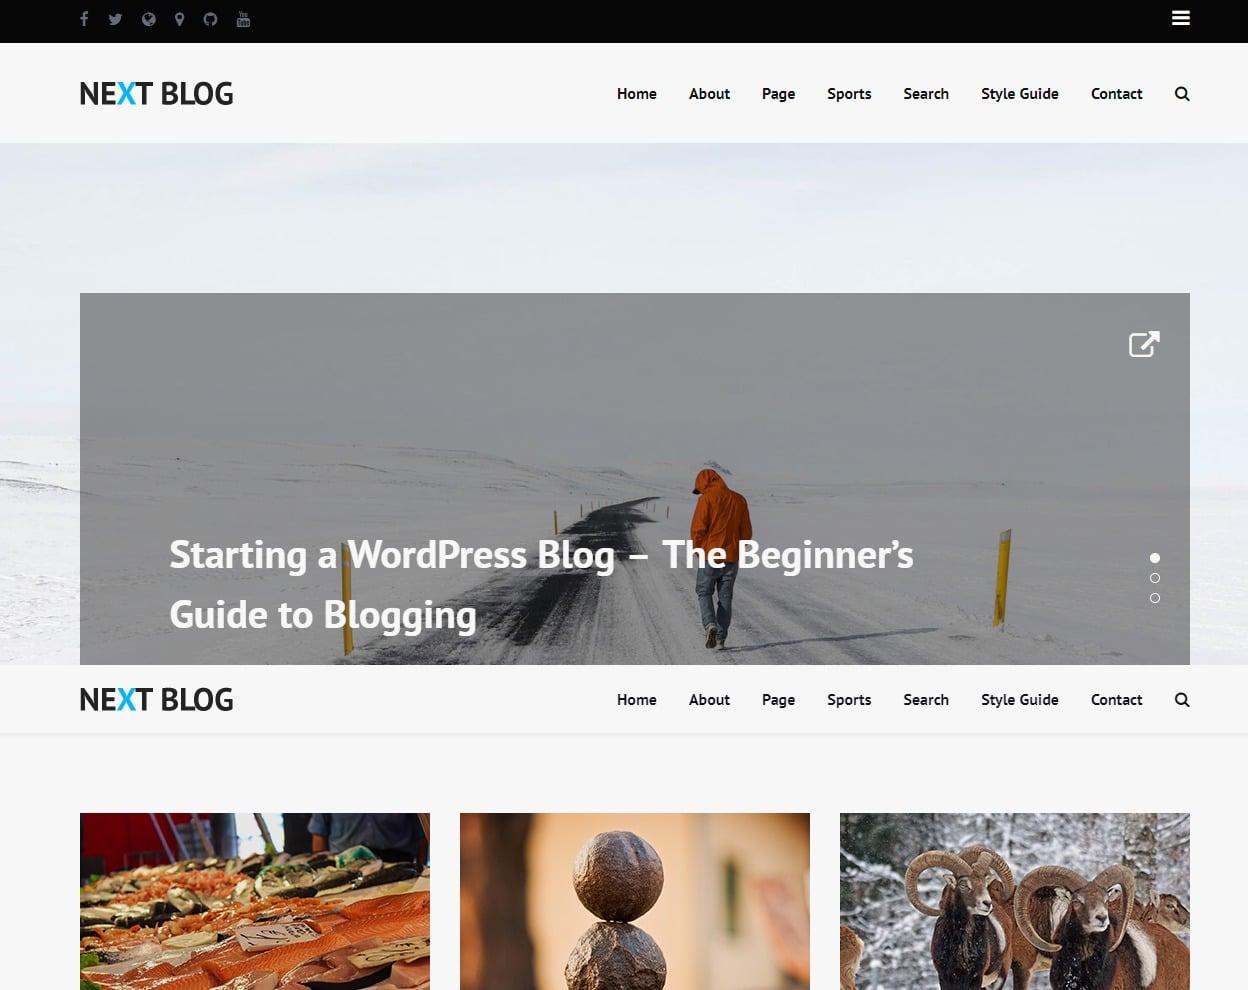 20+ Premium Blog Templates to Create a Stunning Blog 2018 - uiCookies